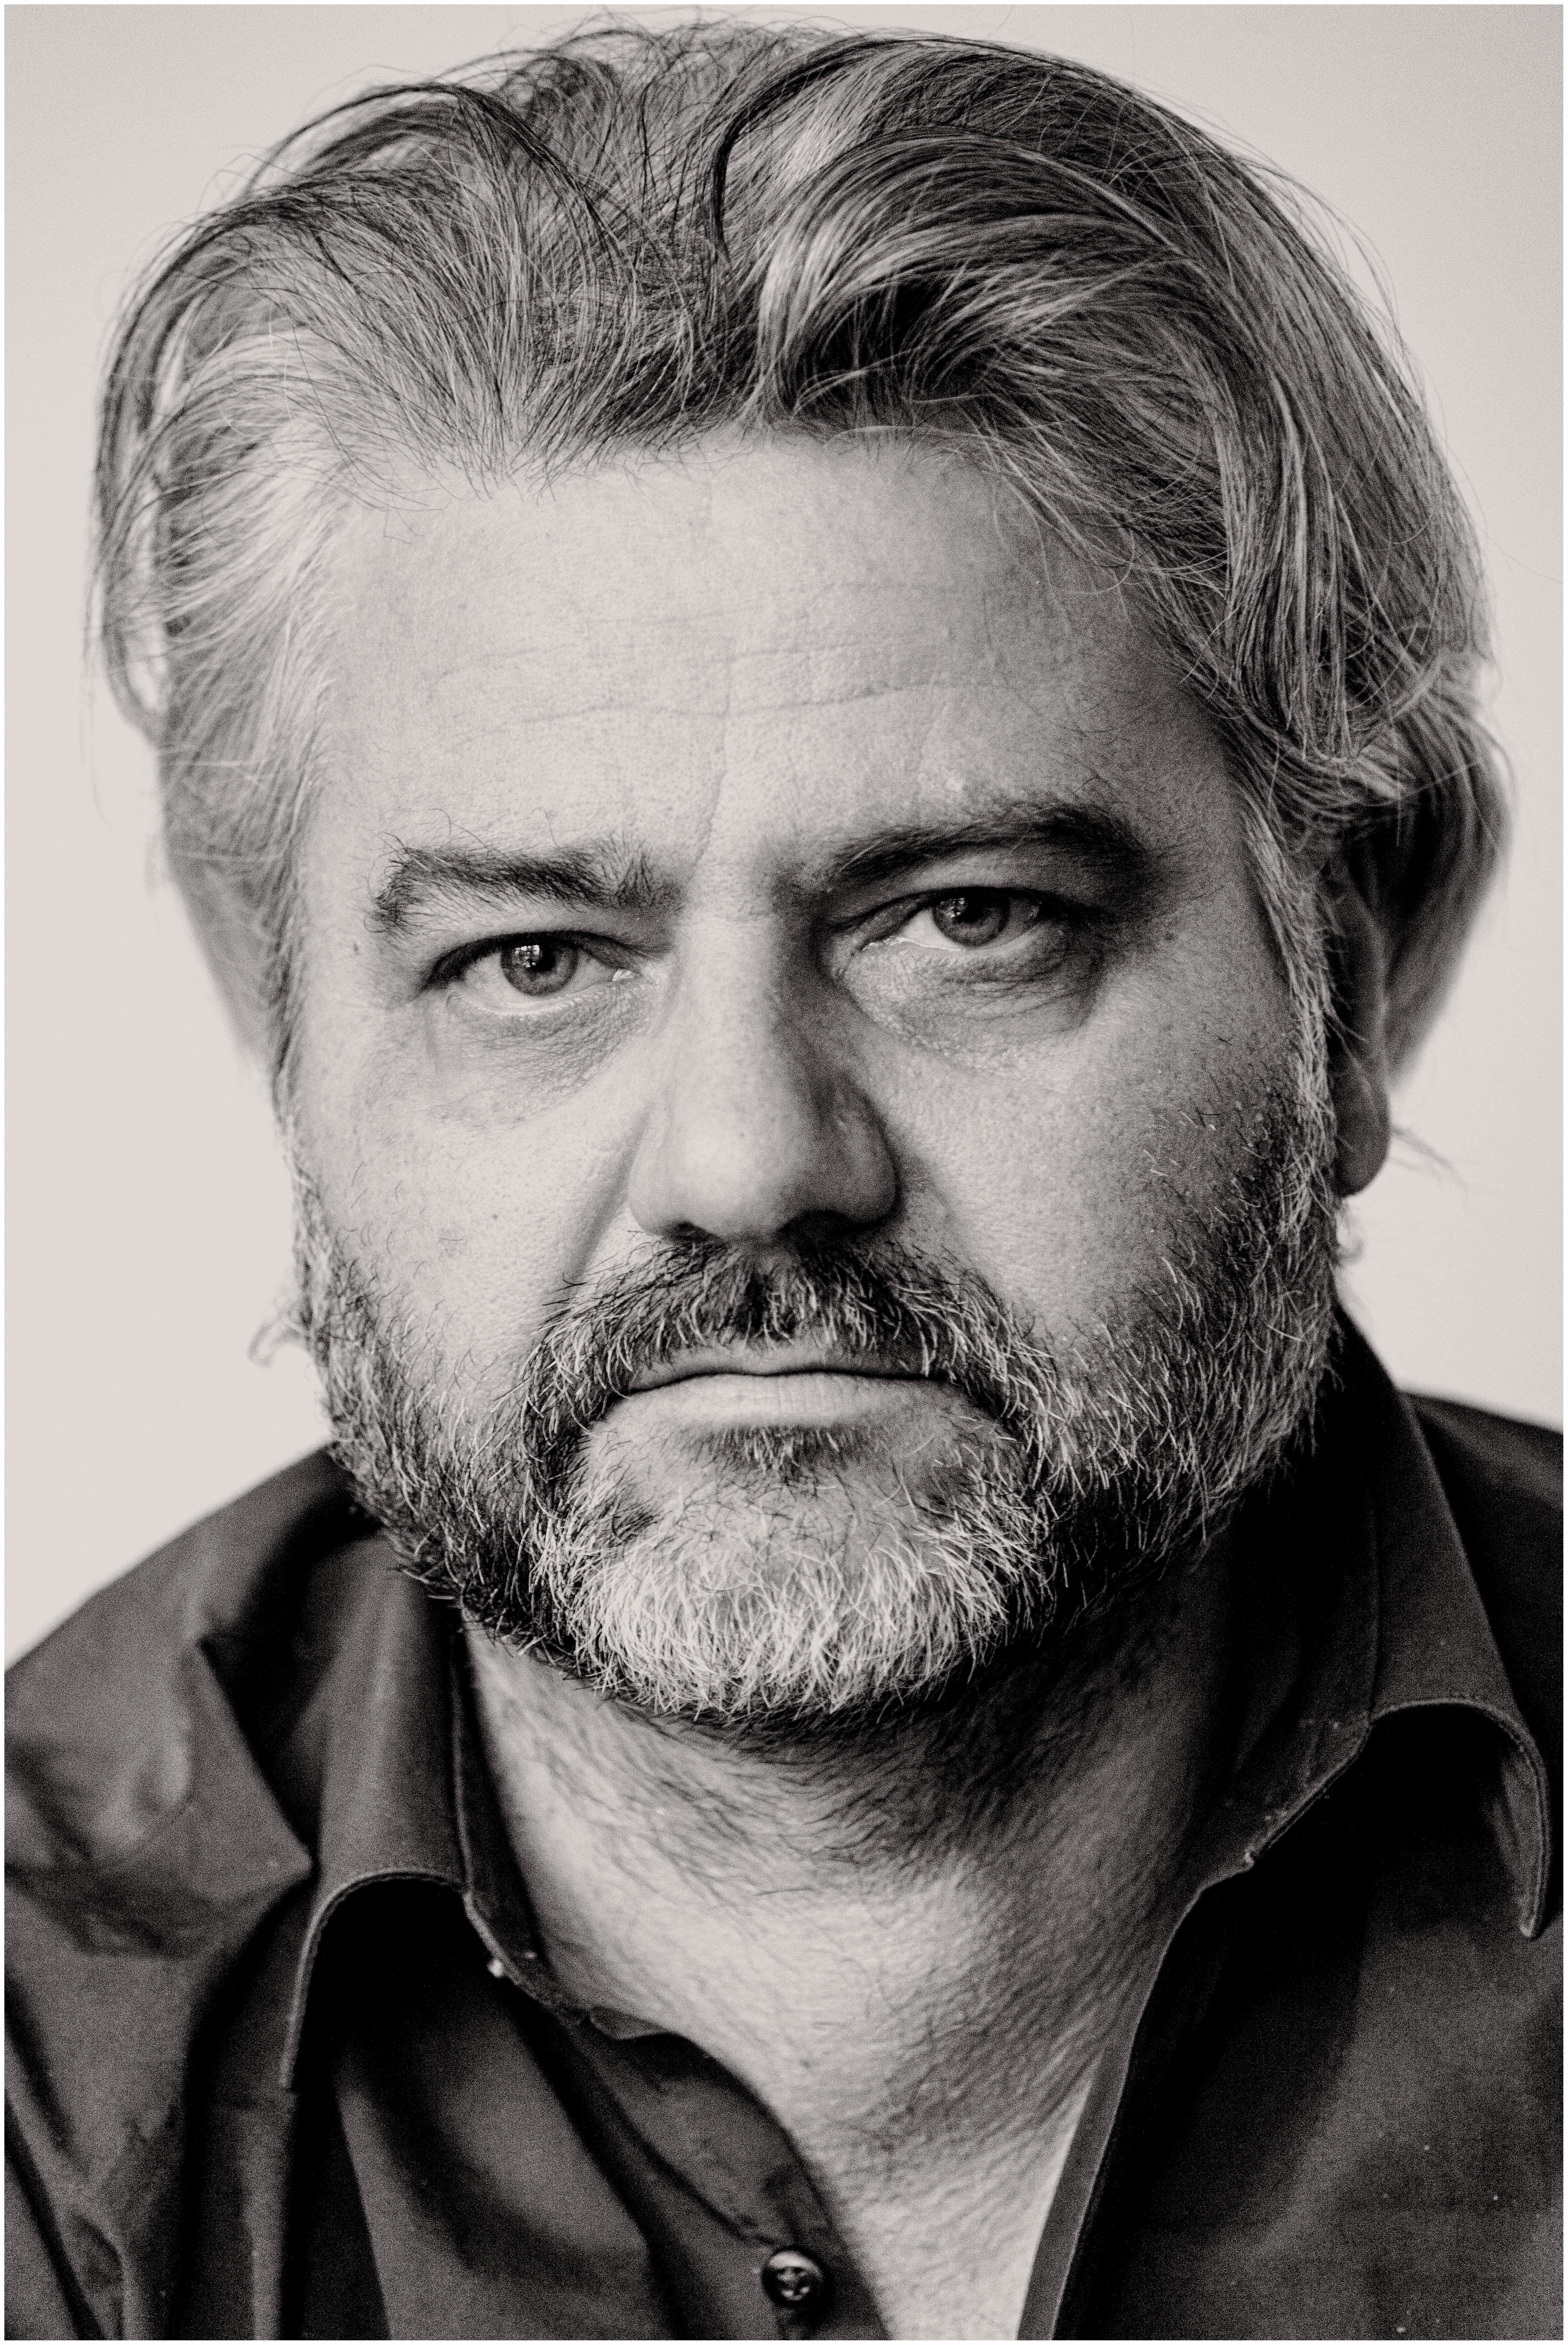 Pascal Verbeken